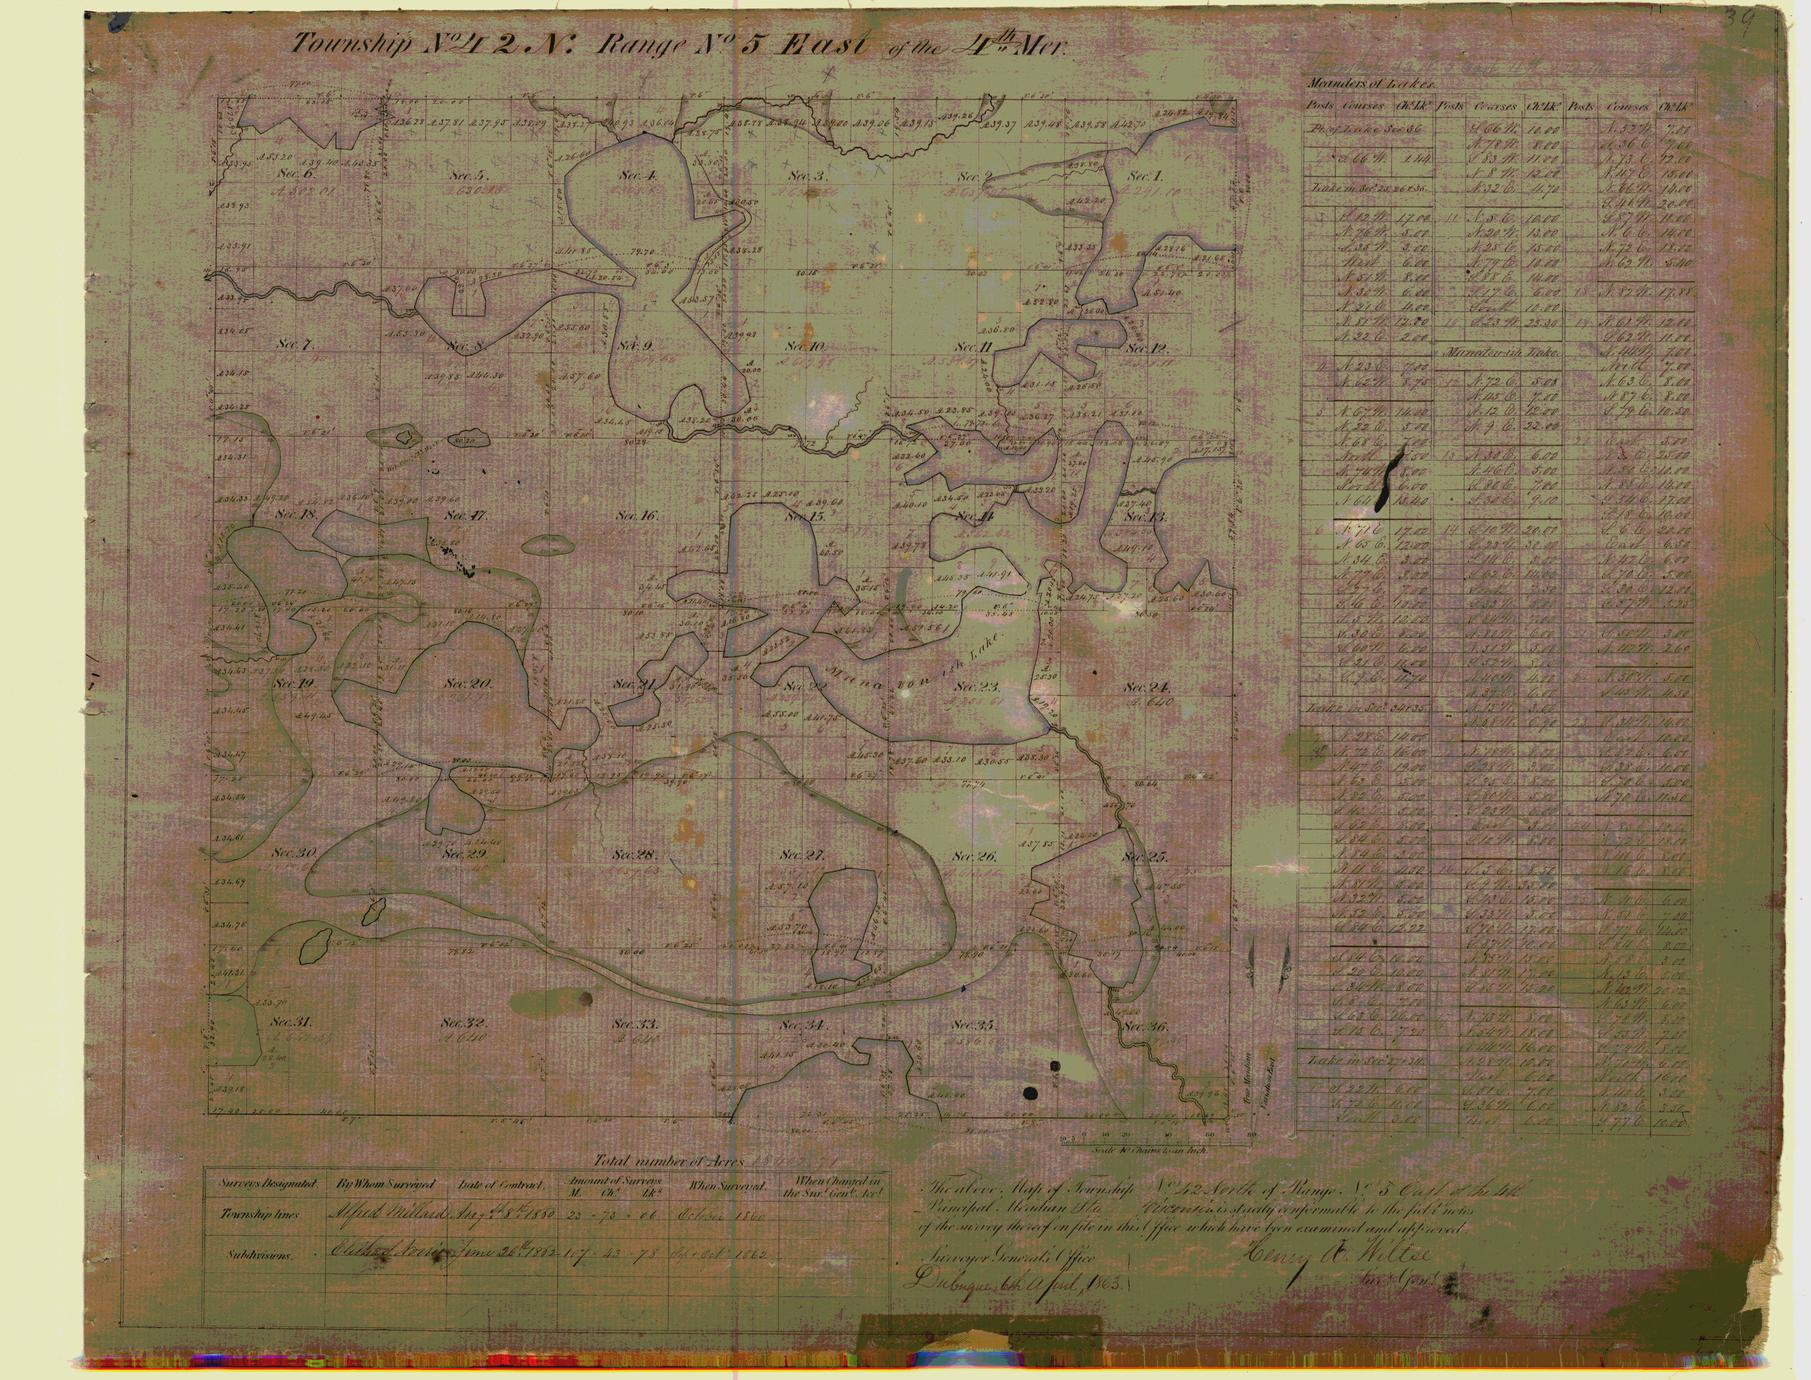 [Public Land Survey System map: Wisconsin Township 42 North, Range 05 East]